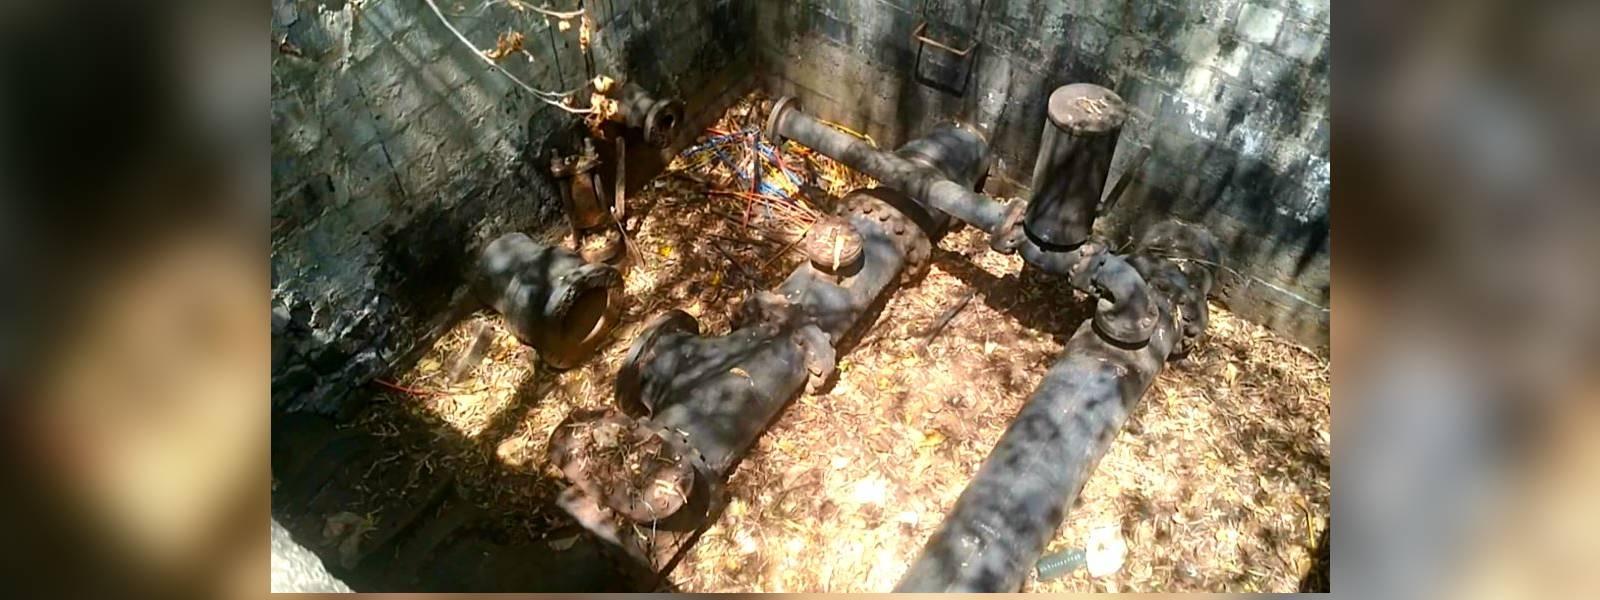 Govt. mulling reclamation of oil tanks in Trincomalee oil farm